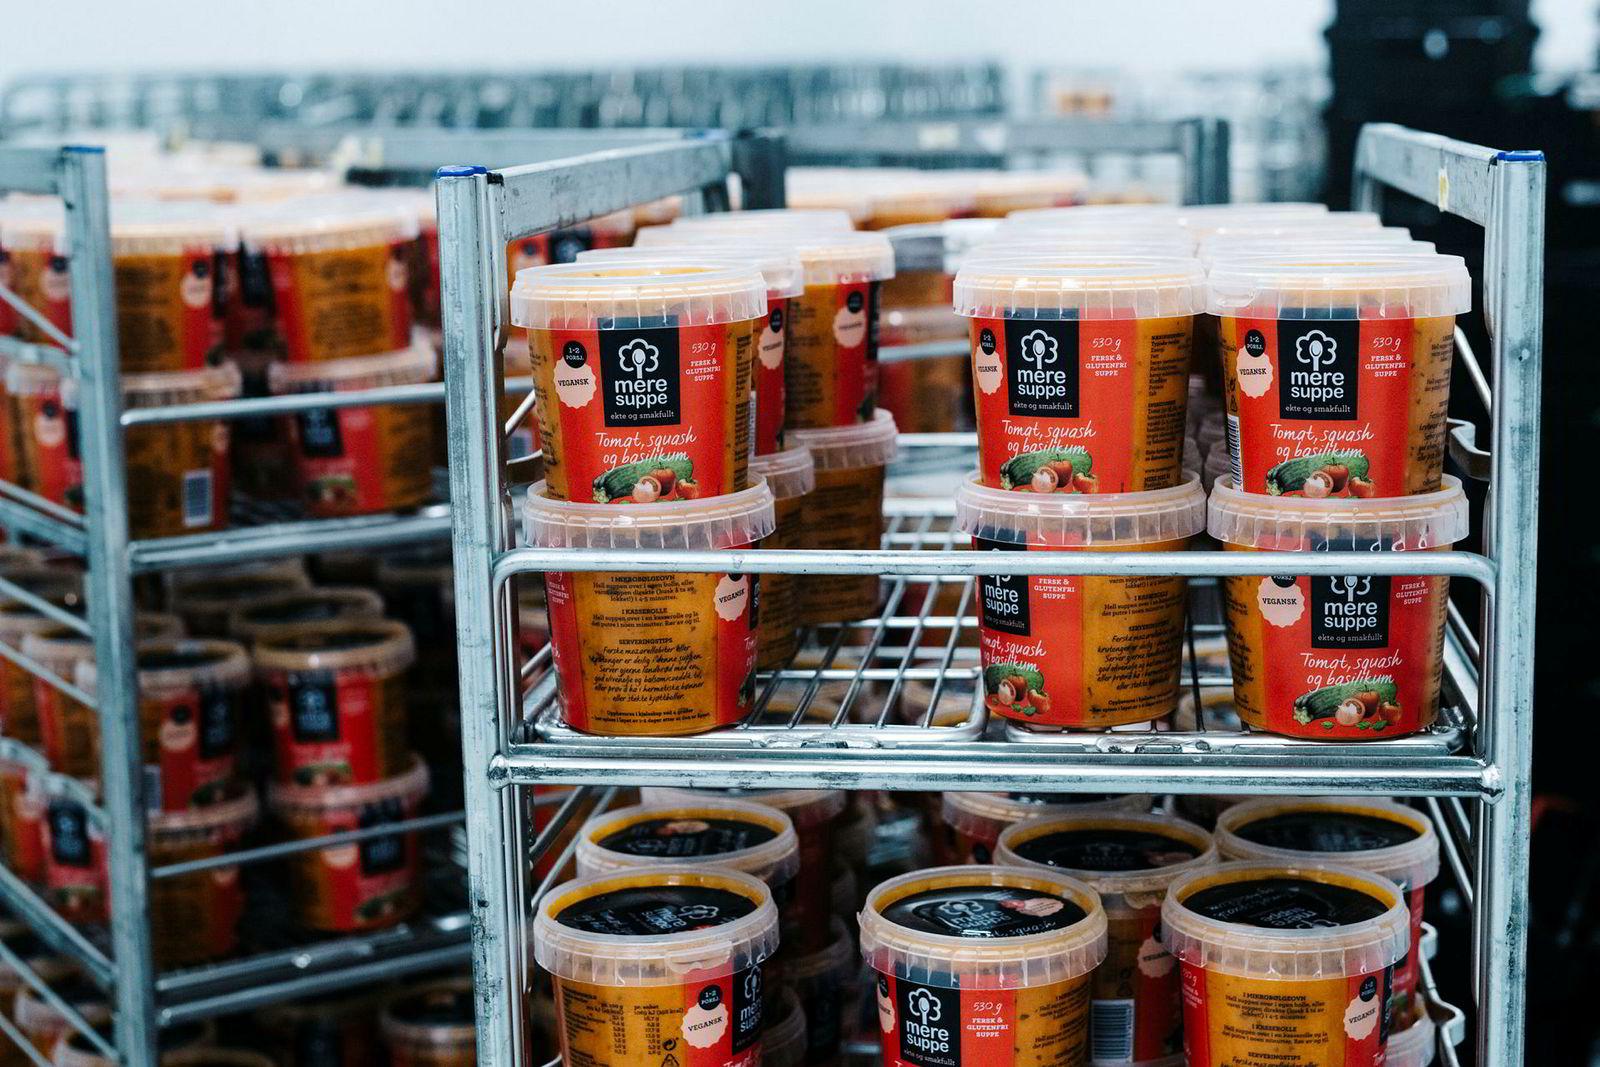 – I år runder vi 300.000 suppe begre, sier salgs- og styreleder Elisabeth I. Rye-Florentz i Mere Mat.